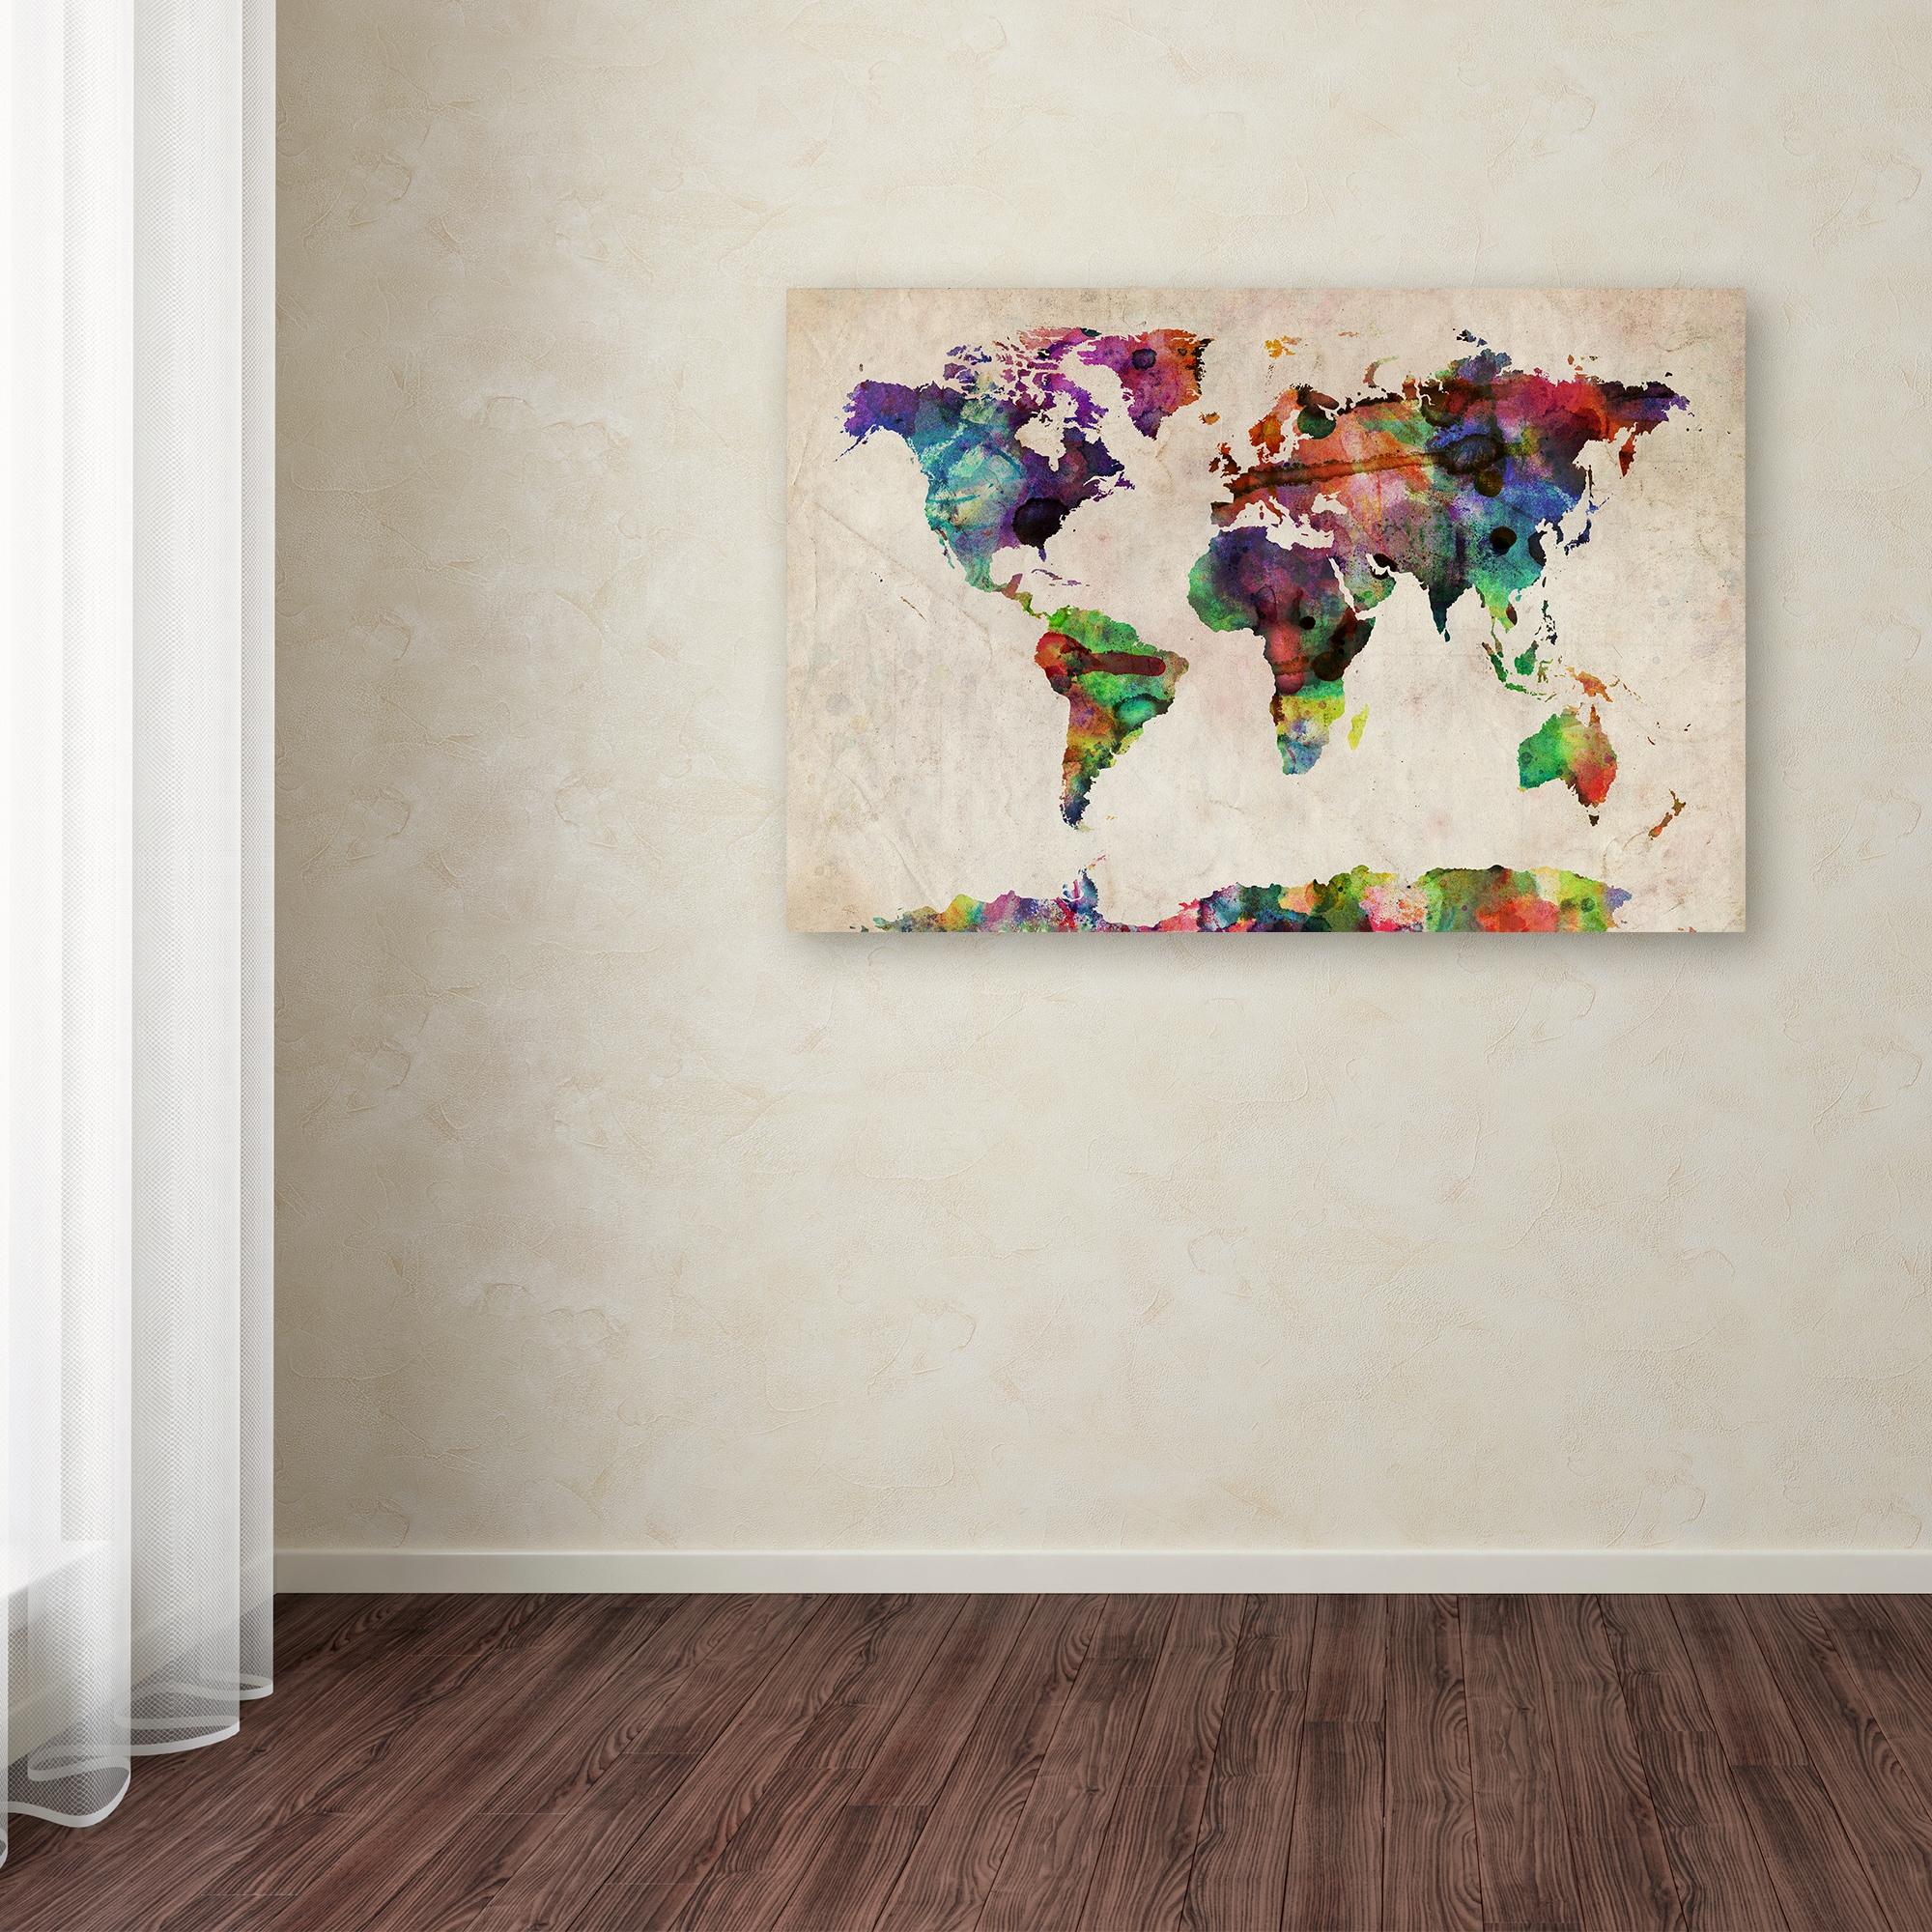 Urban Watercolor World Map.Shop Michael Tompsett Urban Watercolor World Map Canvas Wall Art